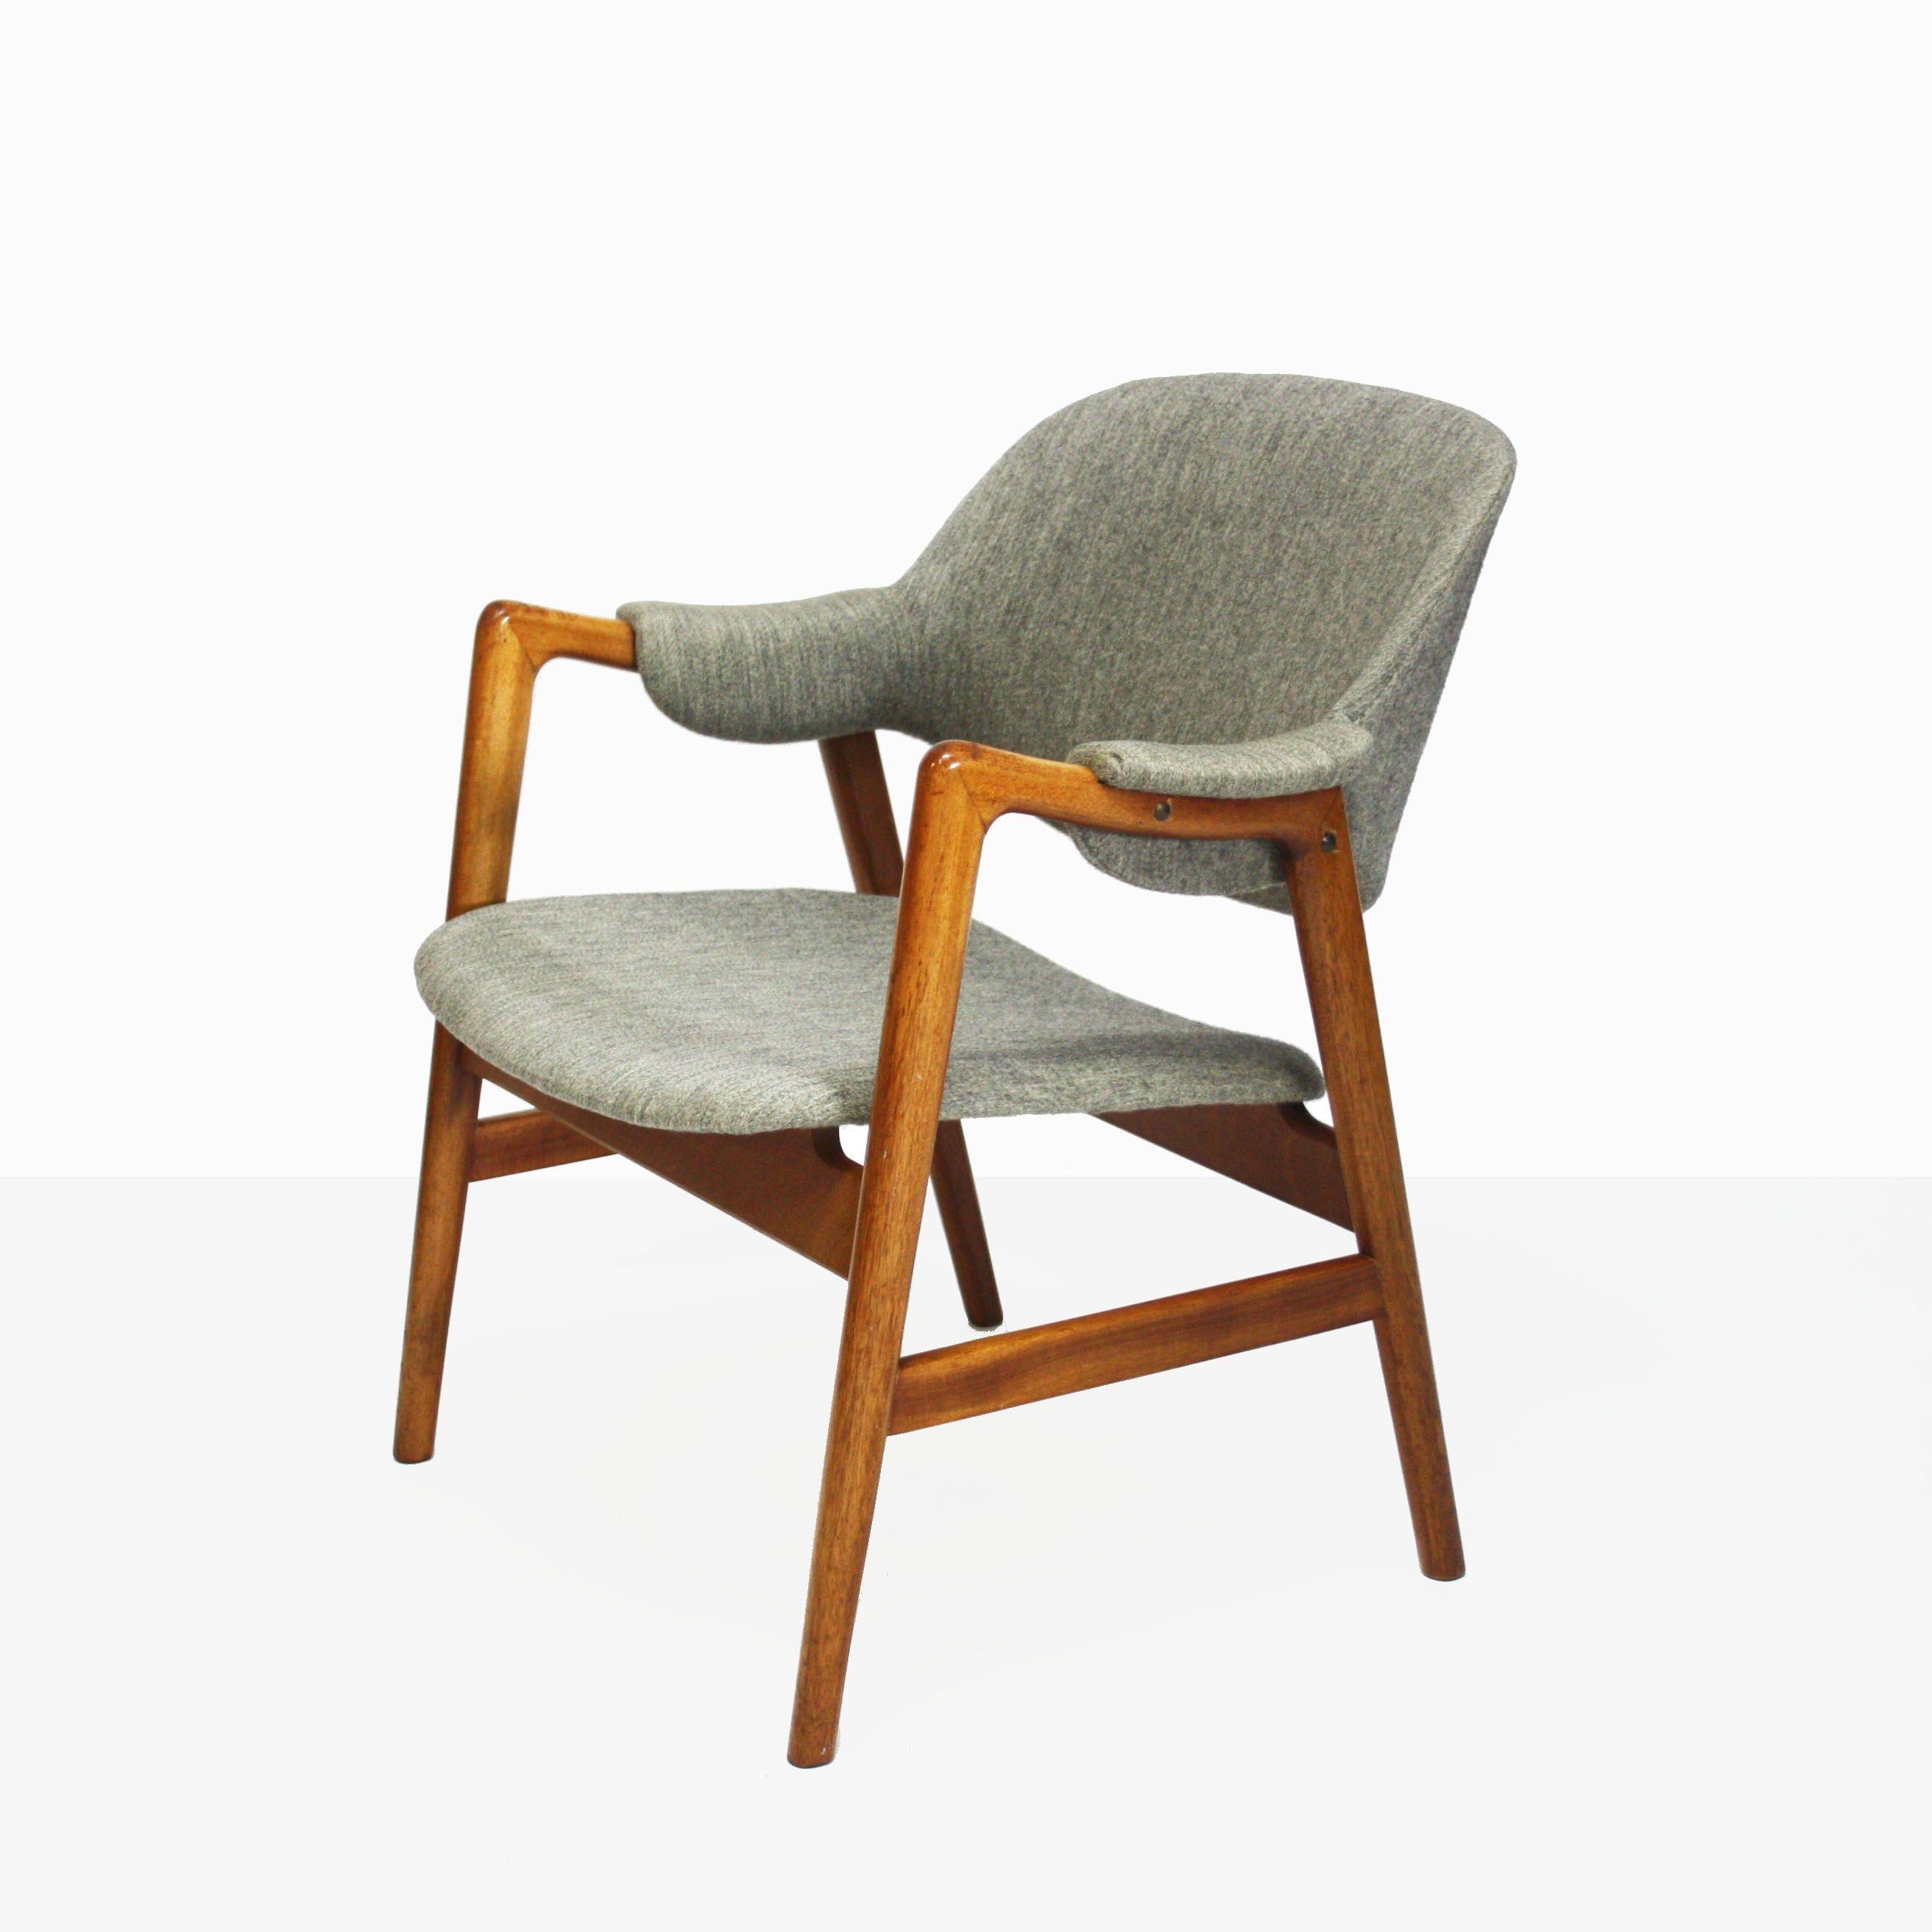 Mid century dansk stol – Skogen Design